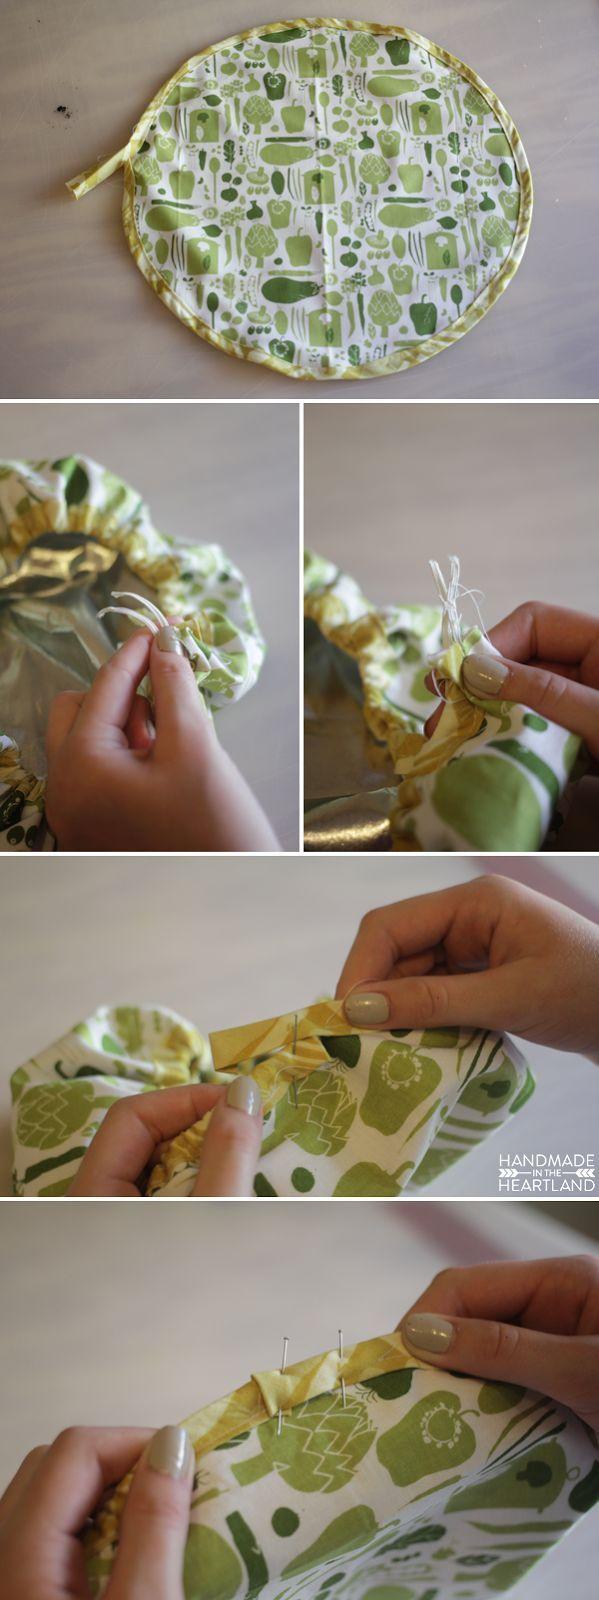 Mybotang fabric scrap series cards - How To Make A Mixing Bowl Cover